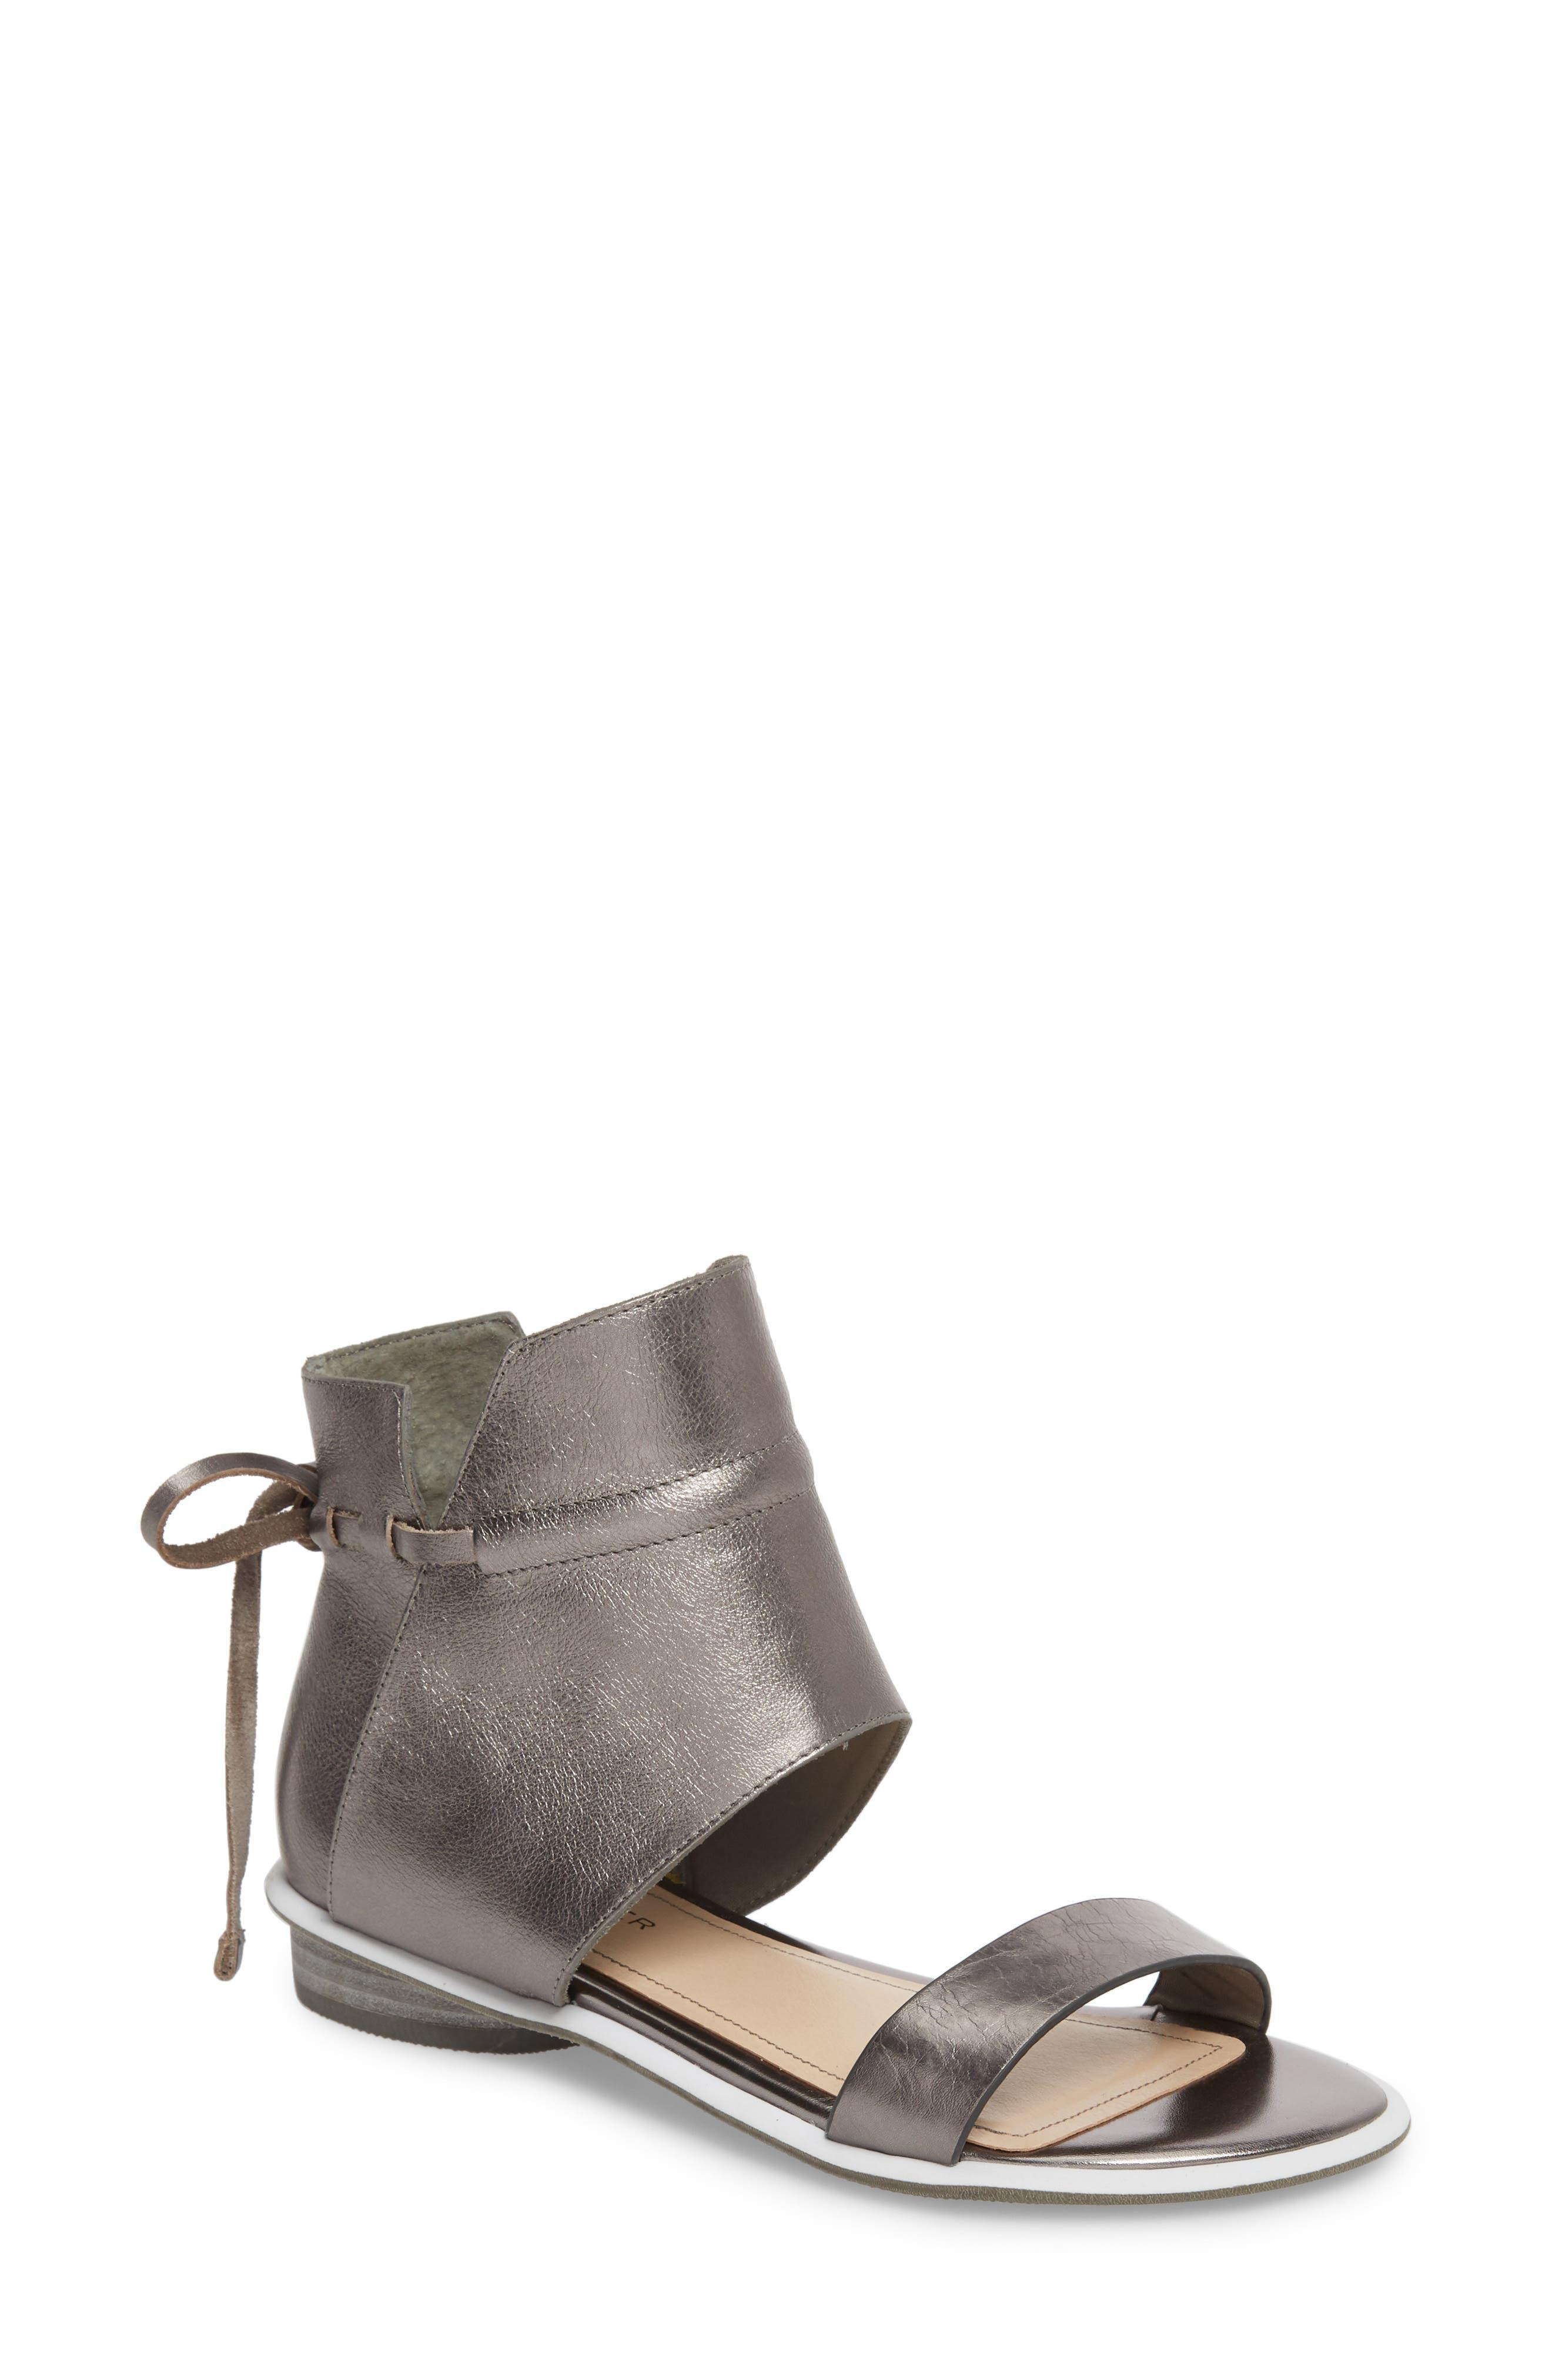 Kelsi Dagger Shae Two-Piece Sandal